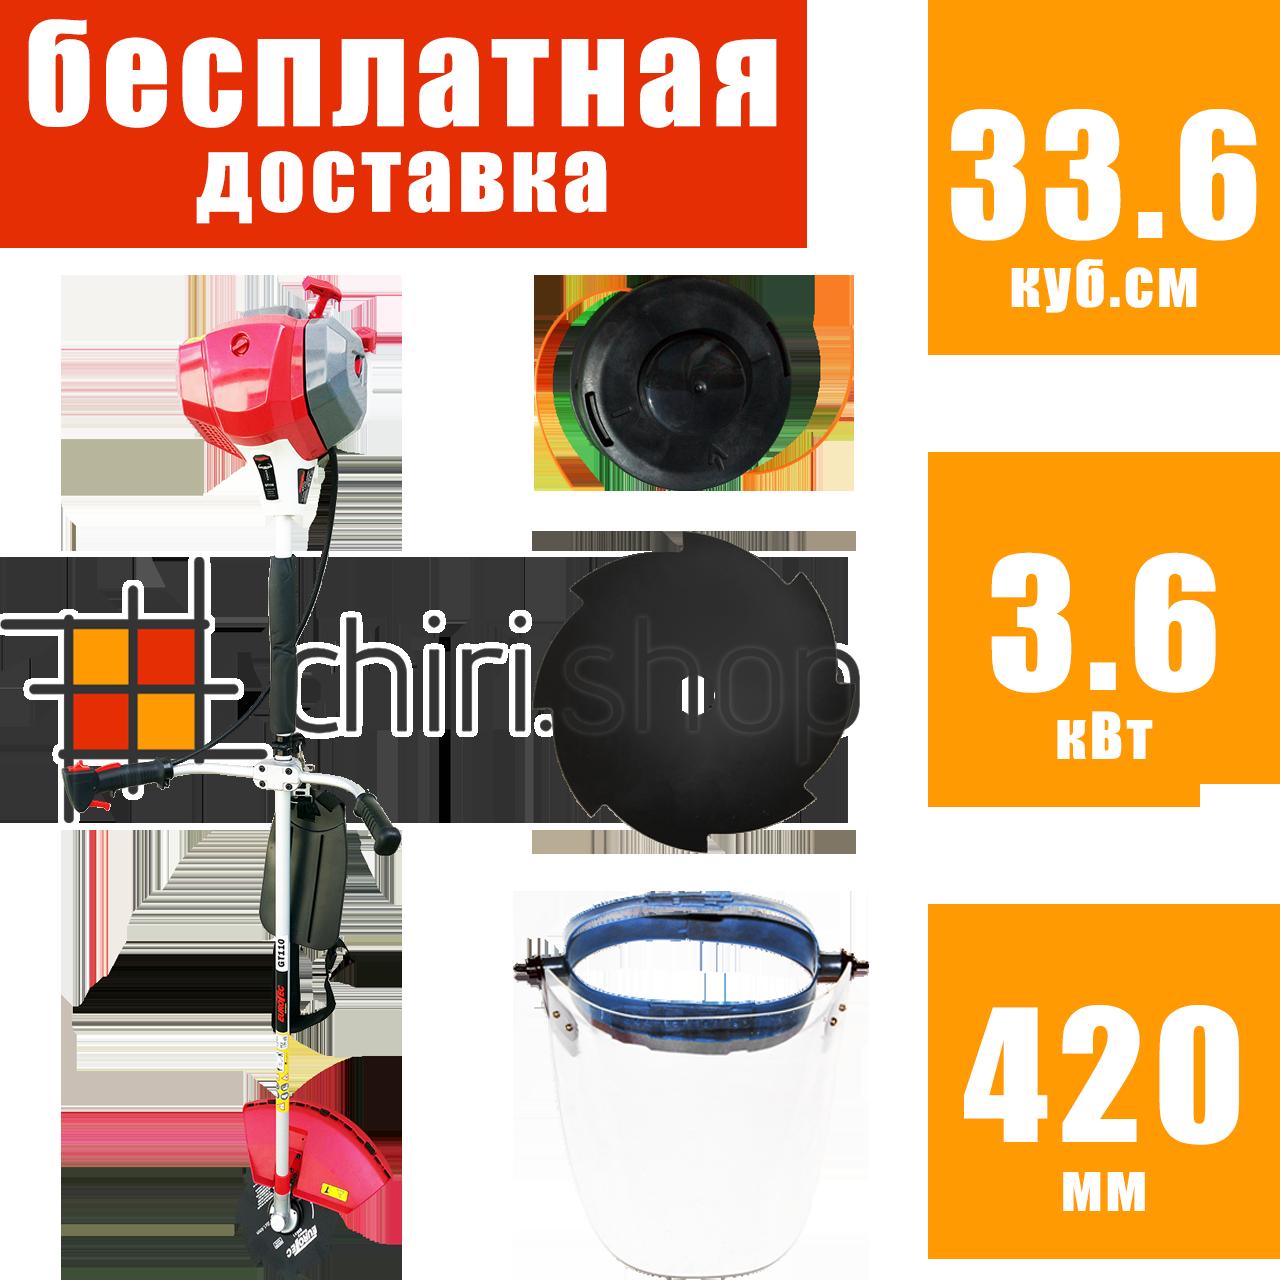 Мотокоса Eurotec GT 110 (2018) 33.6 куб.см, с ножом и леской, 3.6 кВт, бензокосилка, коса, бензокоса